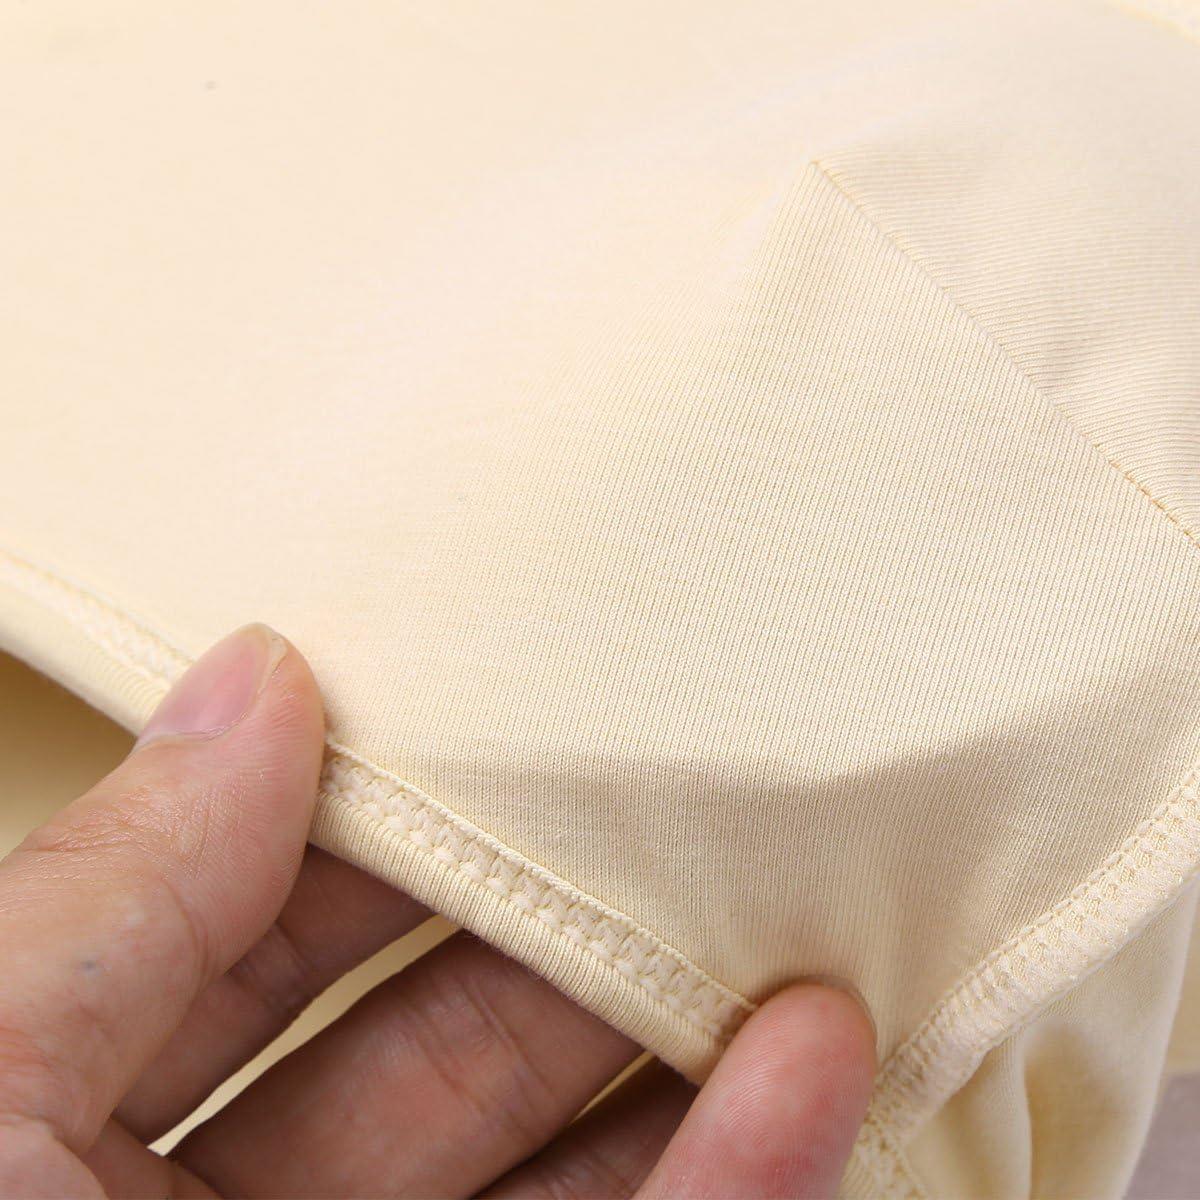 FEESHOW Mens Hiding Gaff Panties Breathable Shaping Briefs Underwear for Crossdresser Transgender